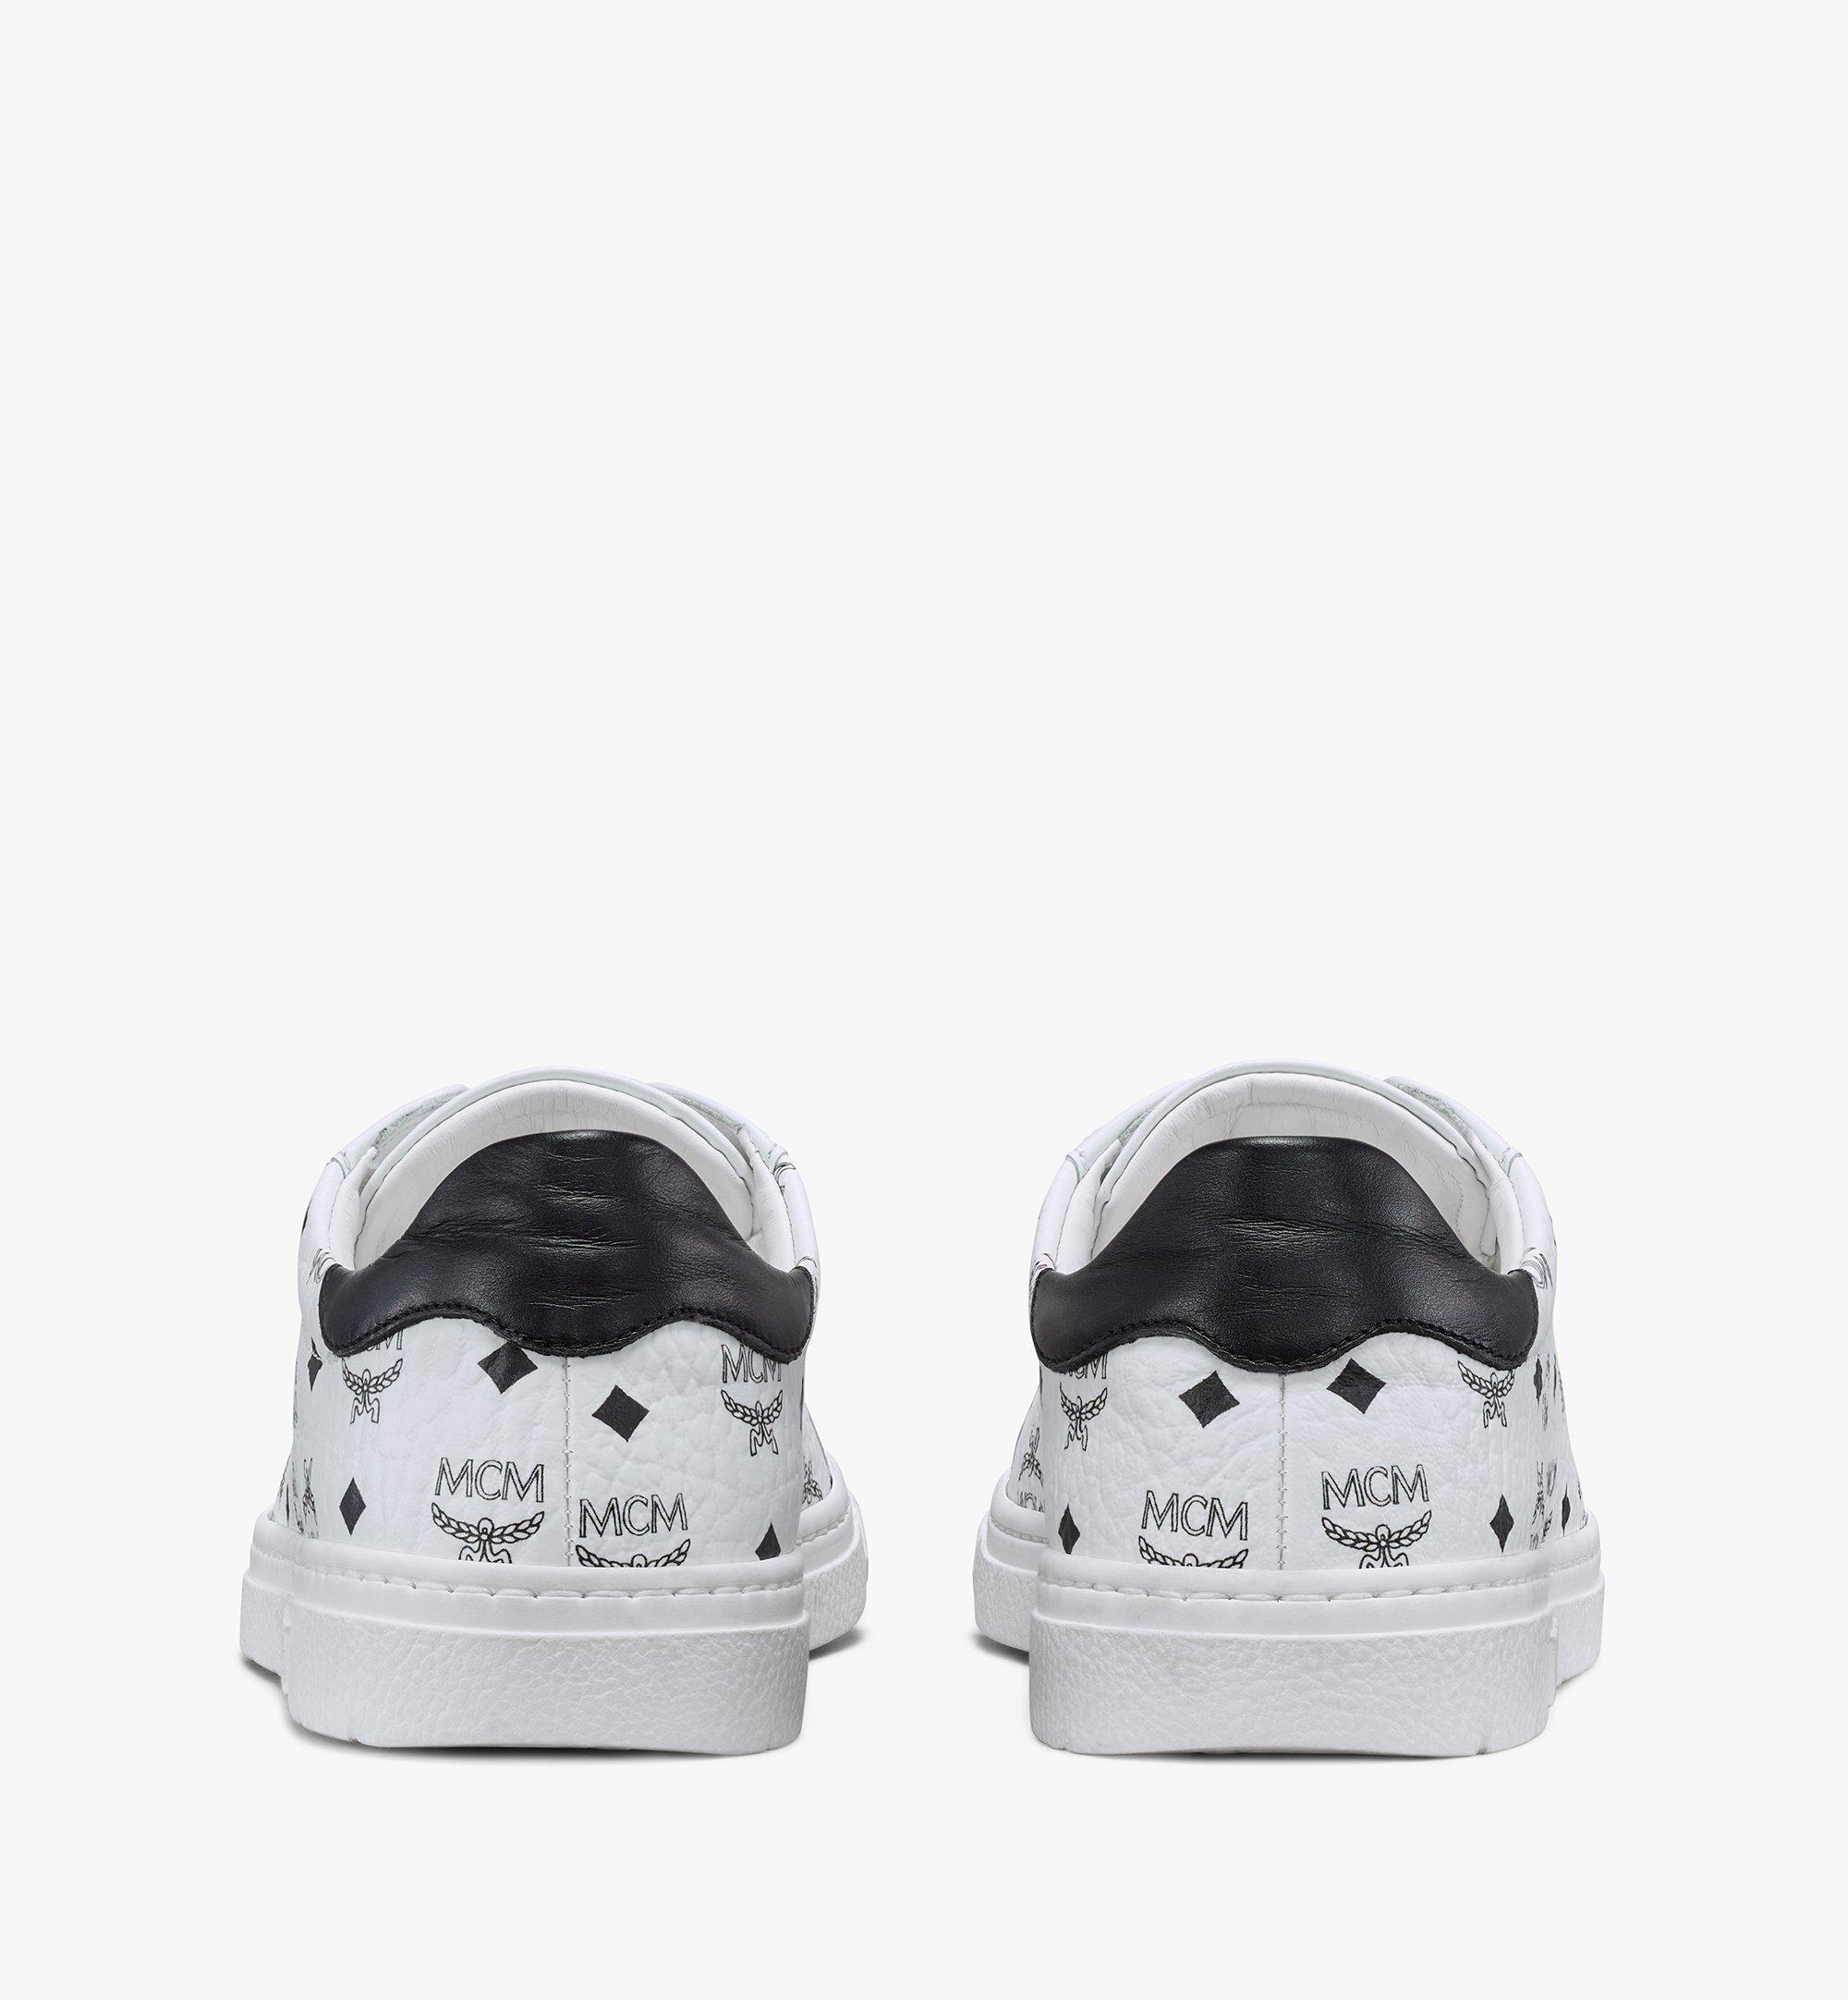 MCM Visetos 系列女士 Terrain Derby 低筒運動鞋 White MESAAMM17WT036 更多視圖 2